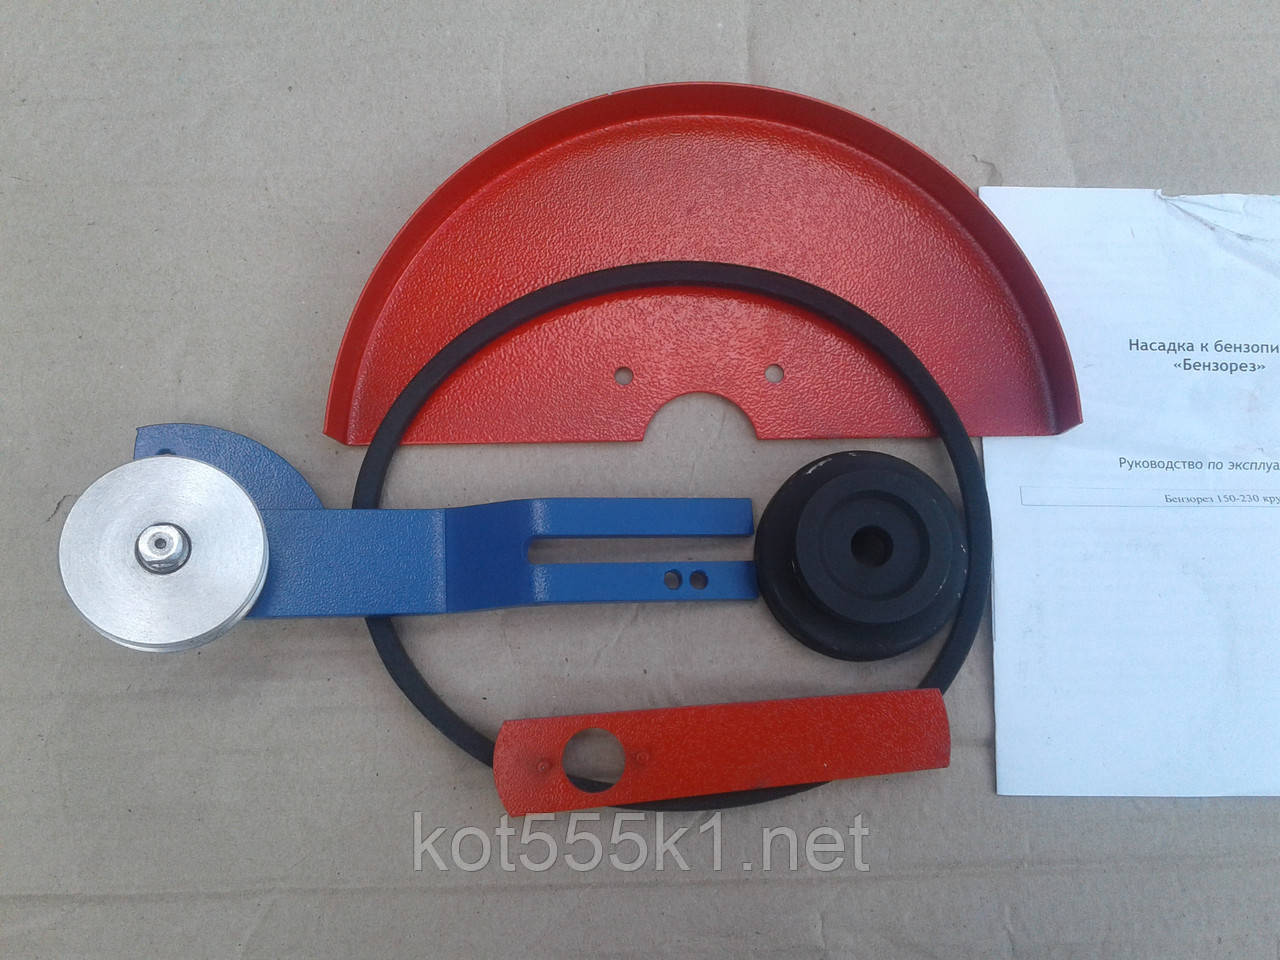 Болгарка насадка на бензопилу  STIHL 180.230.250  Круг 180 мм